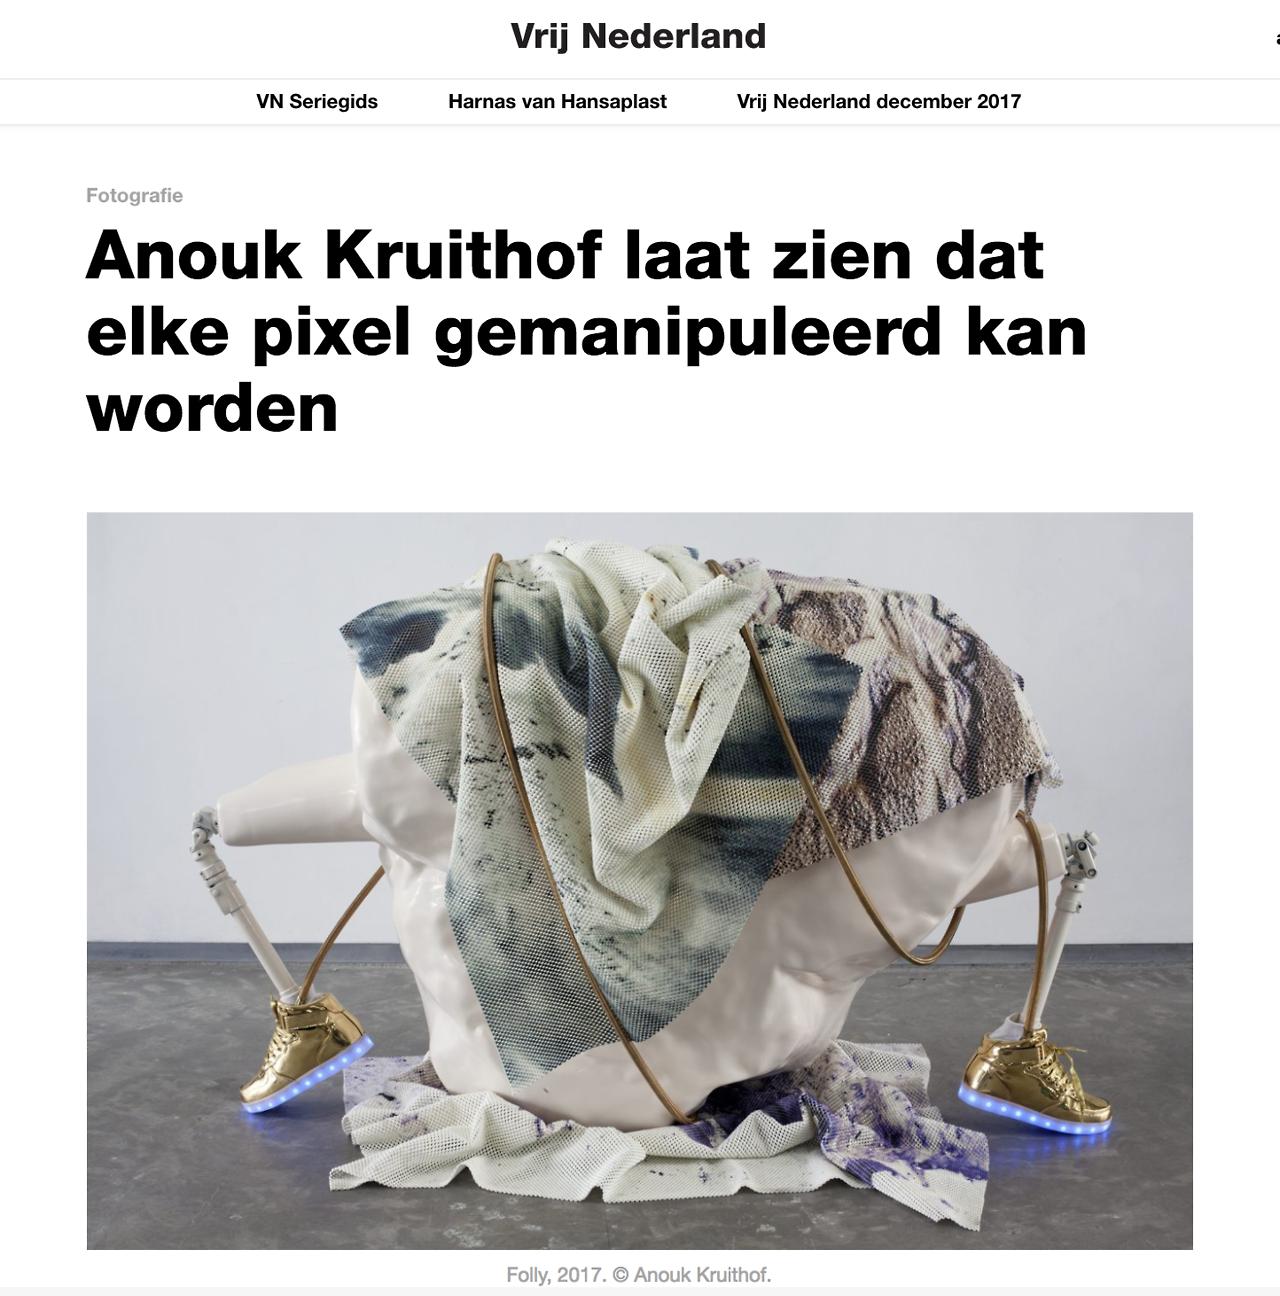 article in Vrij Nederland by Yuki Kho